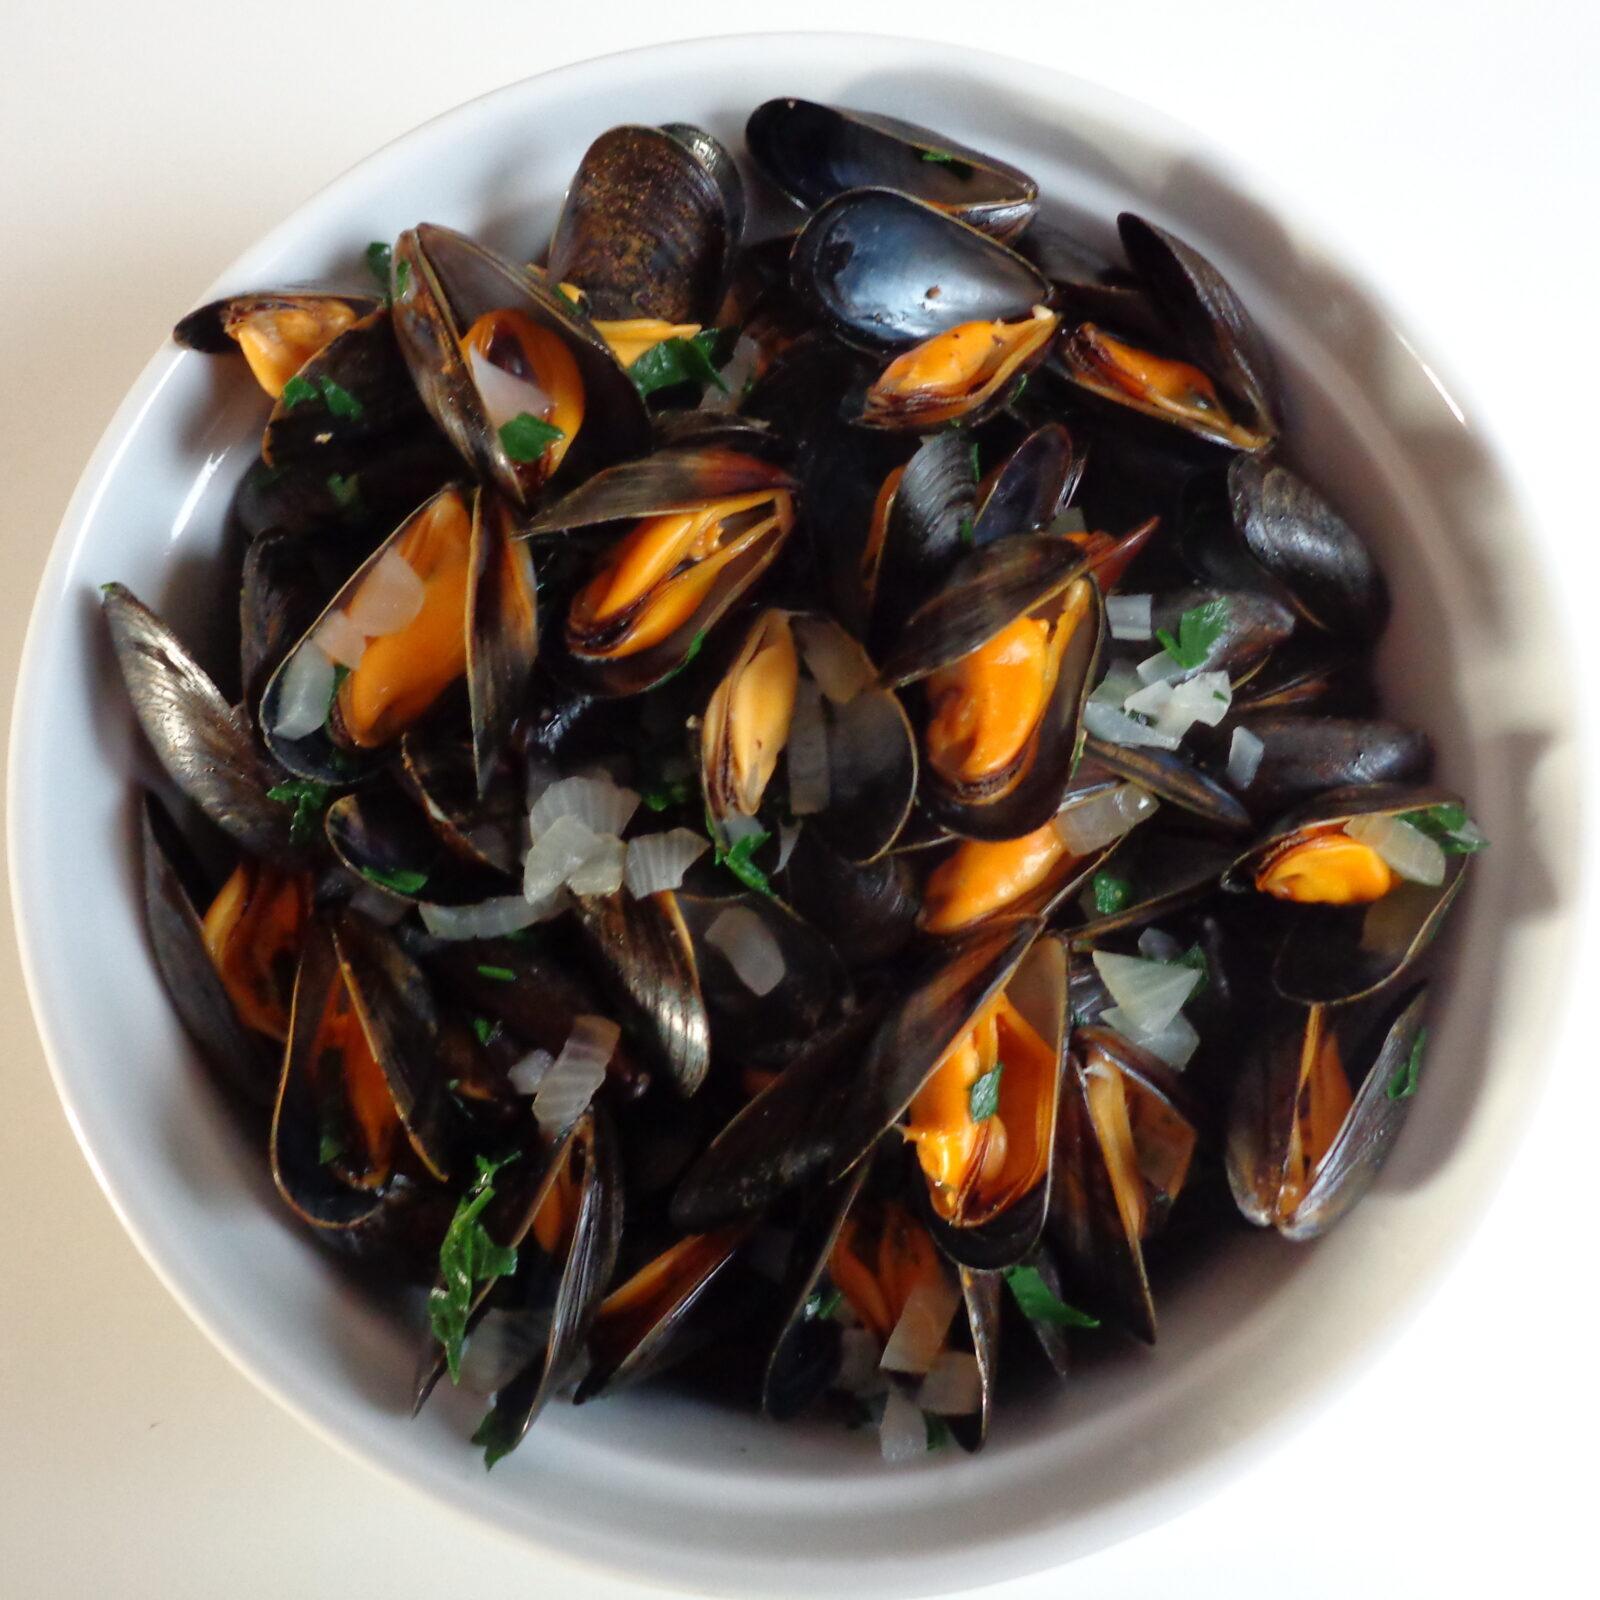 potatoes sc a lloped potatoes shellfish and potatoes a la mariniere ...